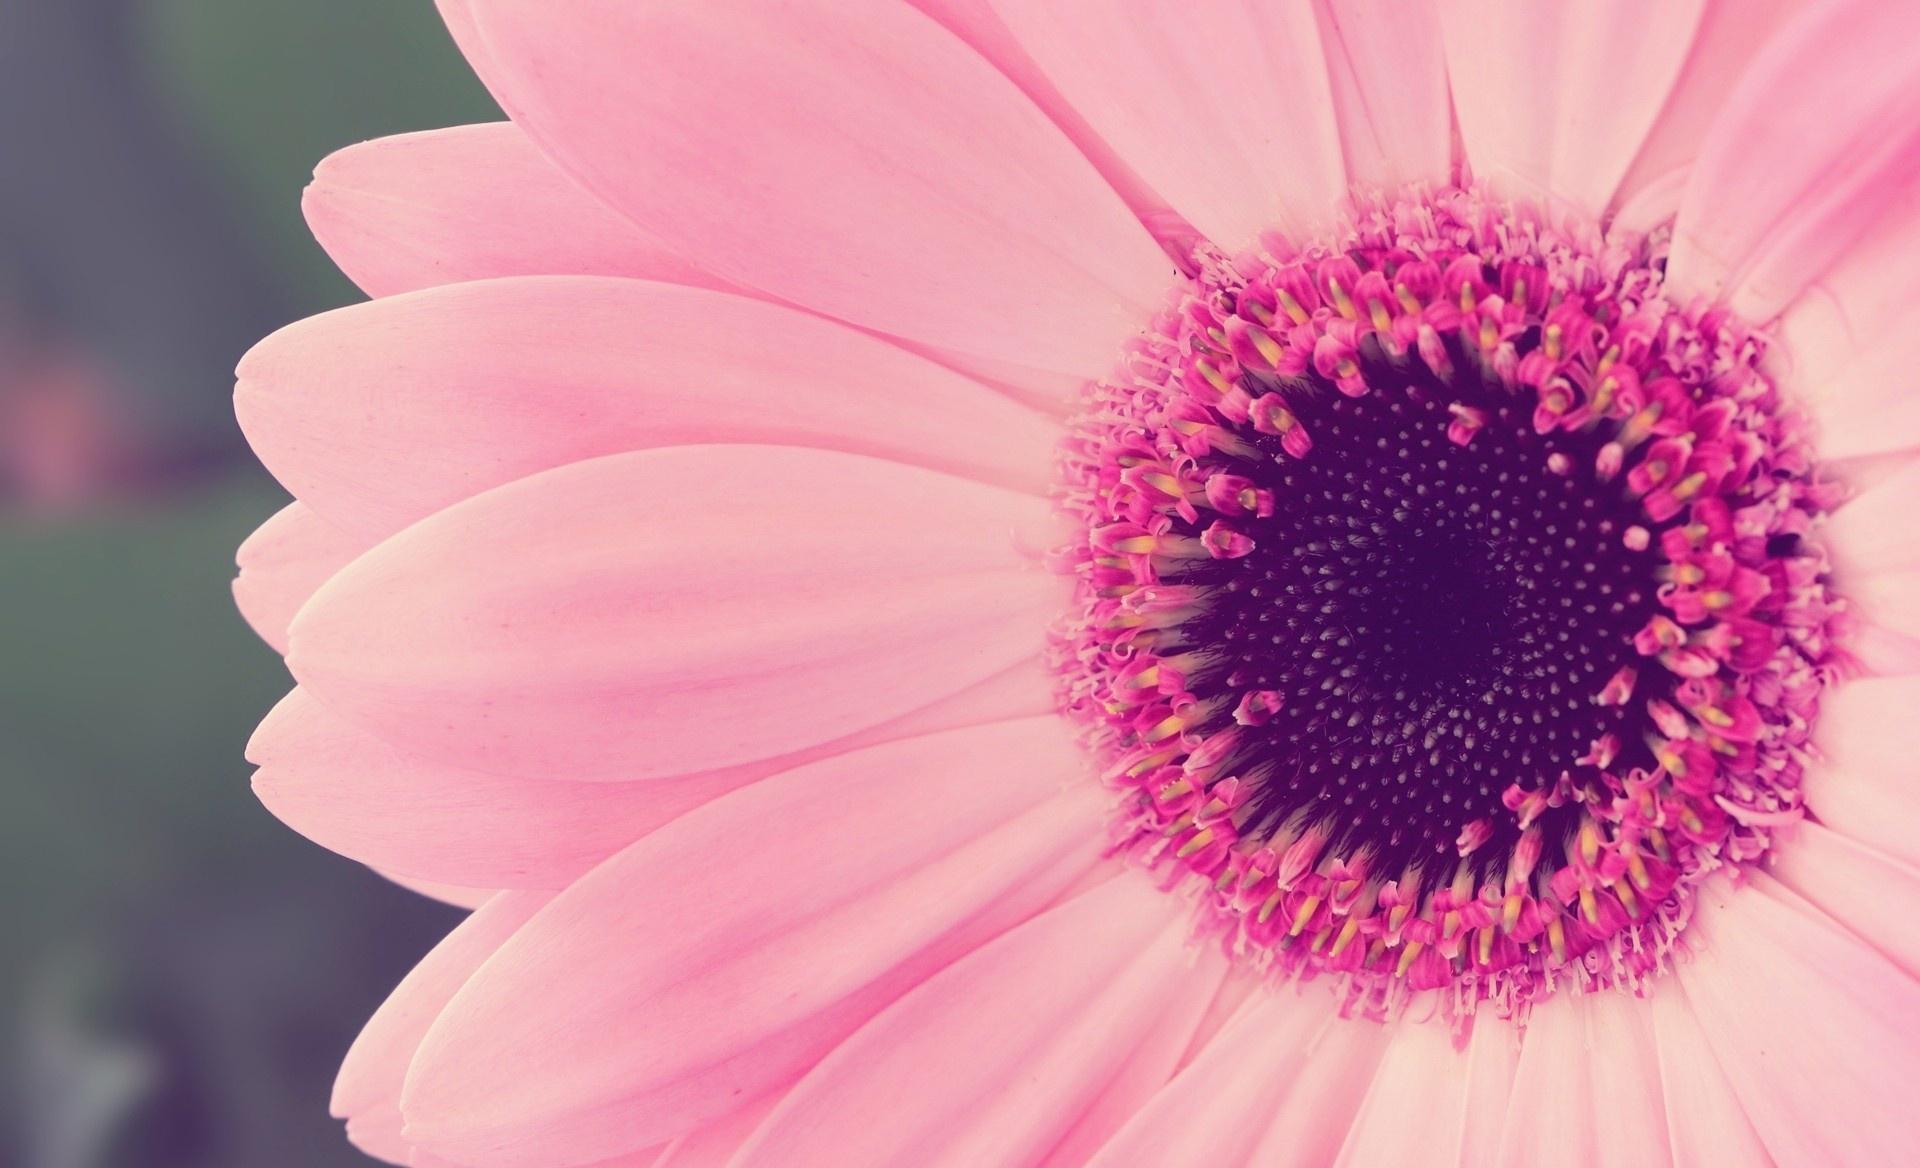 Pink Flower Laptop Wallpaper Pink Flower Desktop The post Flower Wallpaper  Hd appeared first on Share Online - Pink Daisy PNG HD